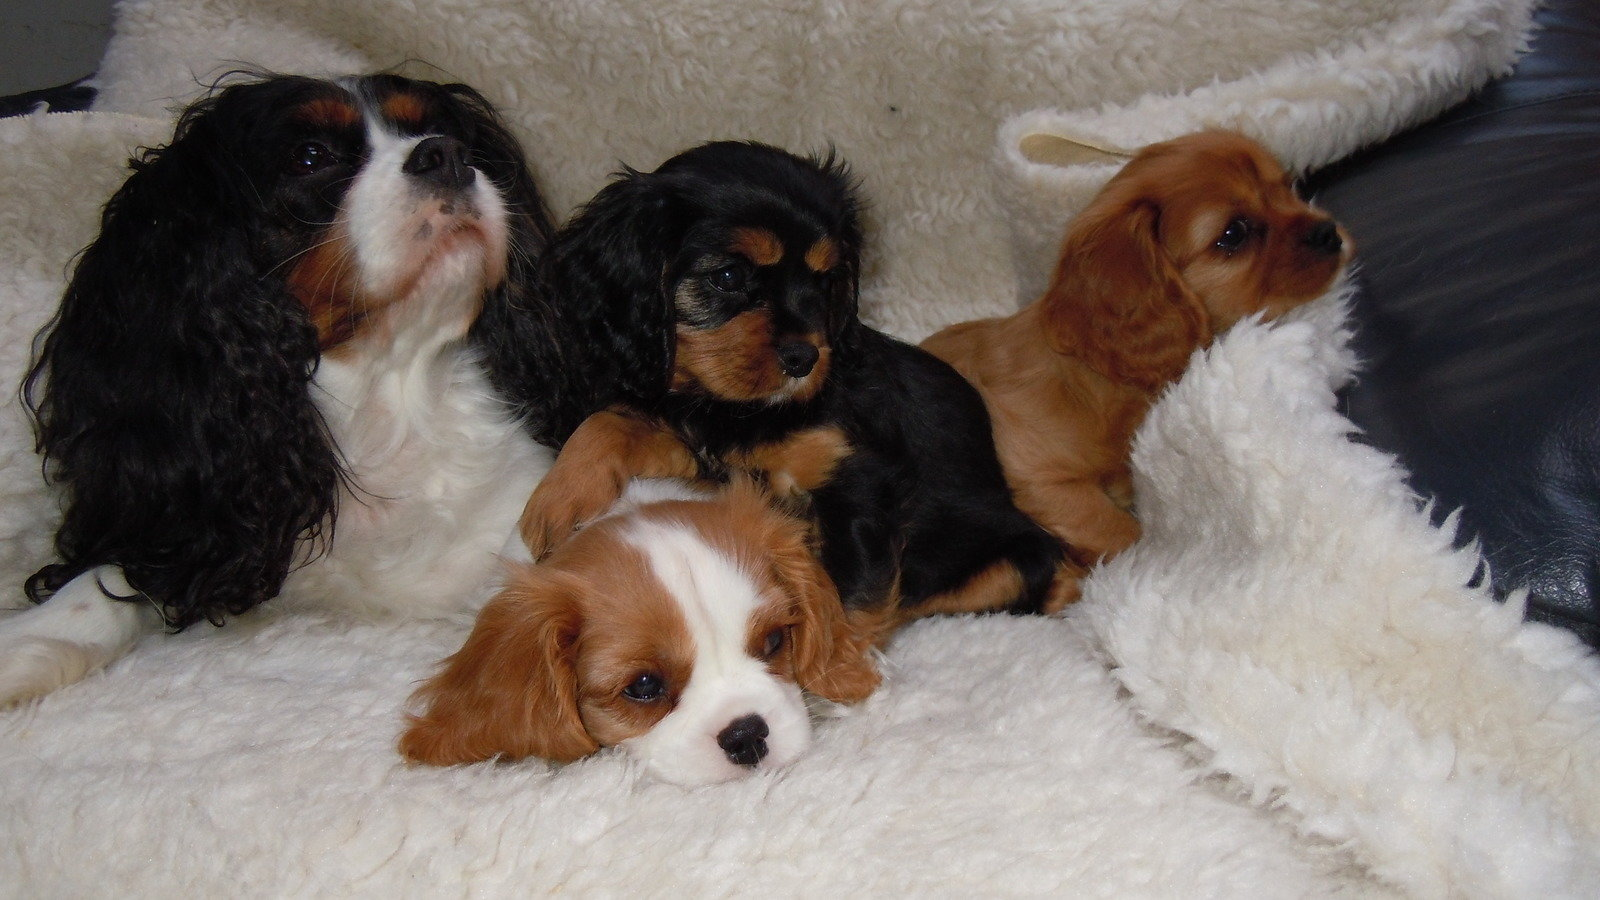 Cavalier King Charles Spaniel Dogs For Sale In Uk